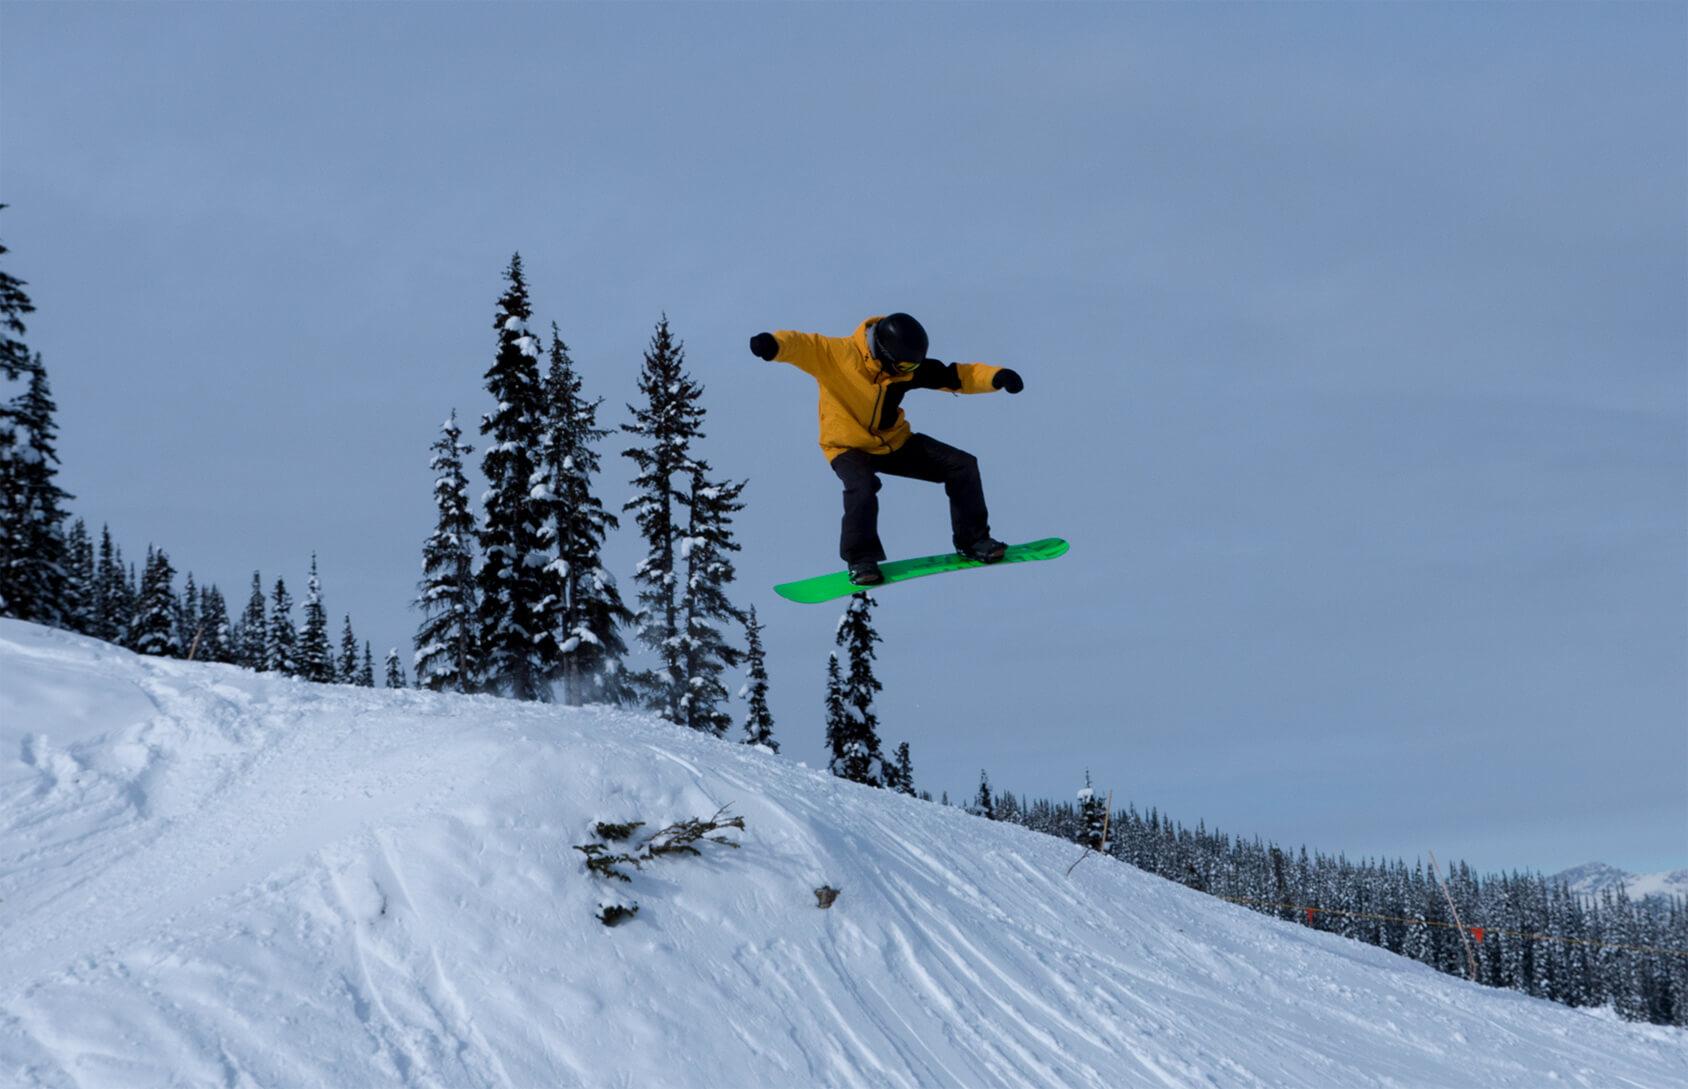 Snowboarding in Powder